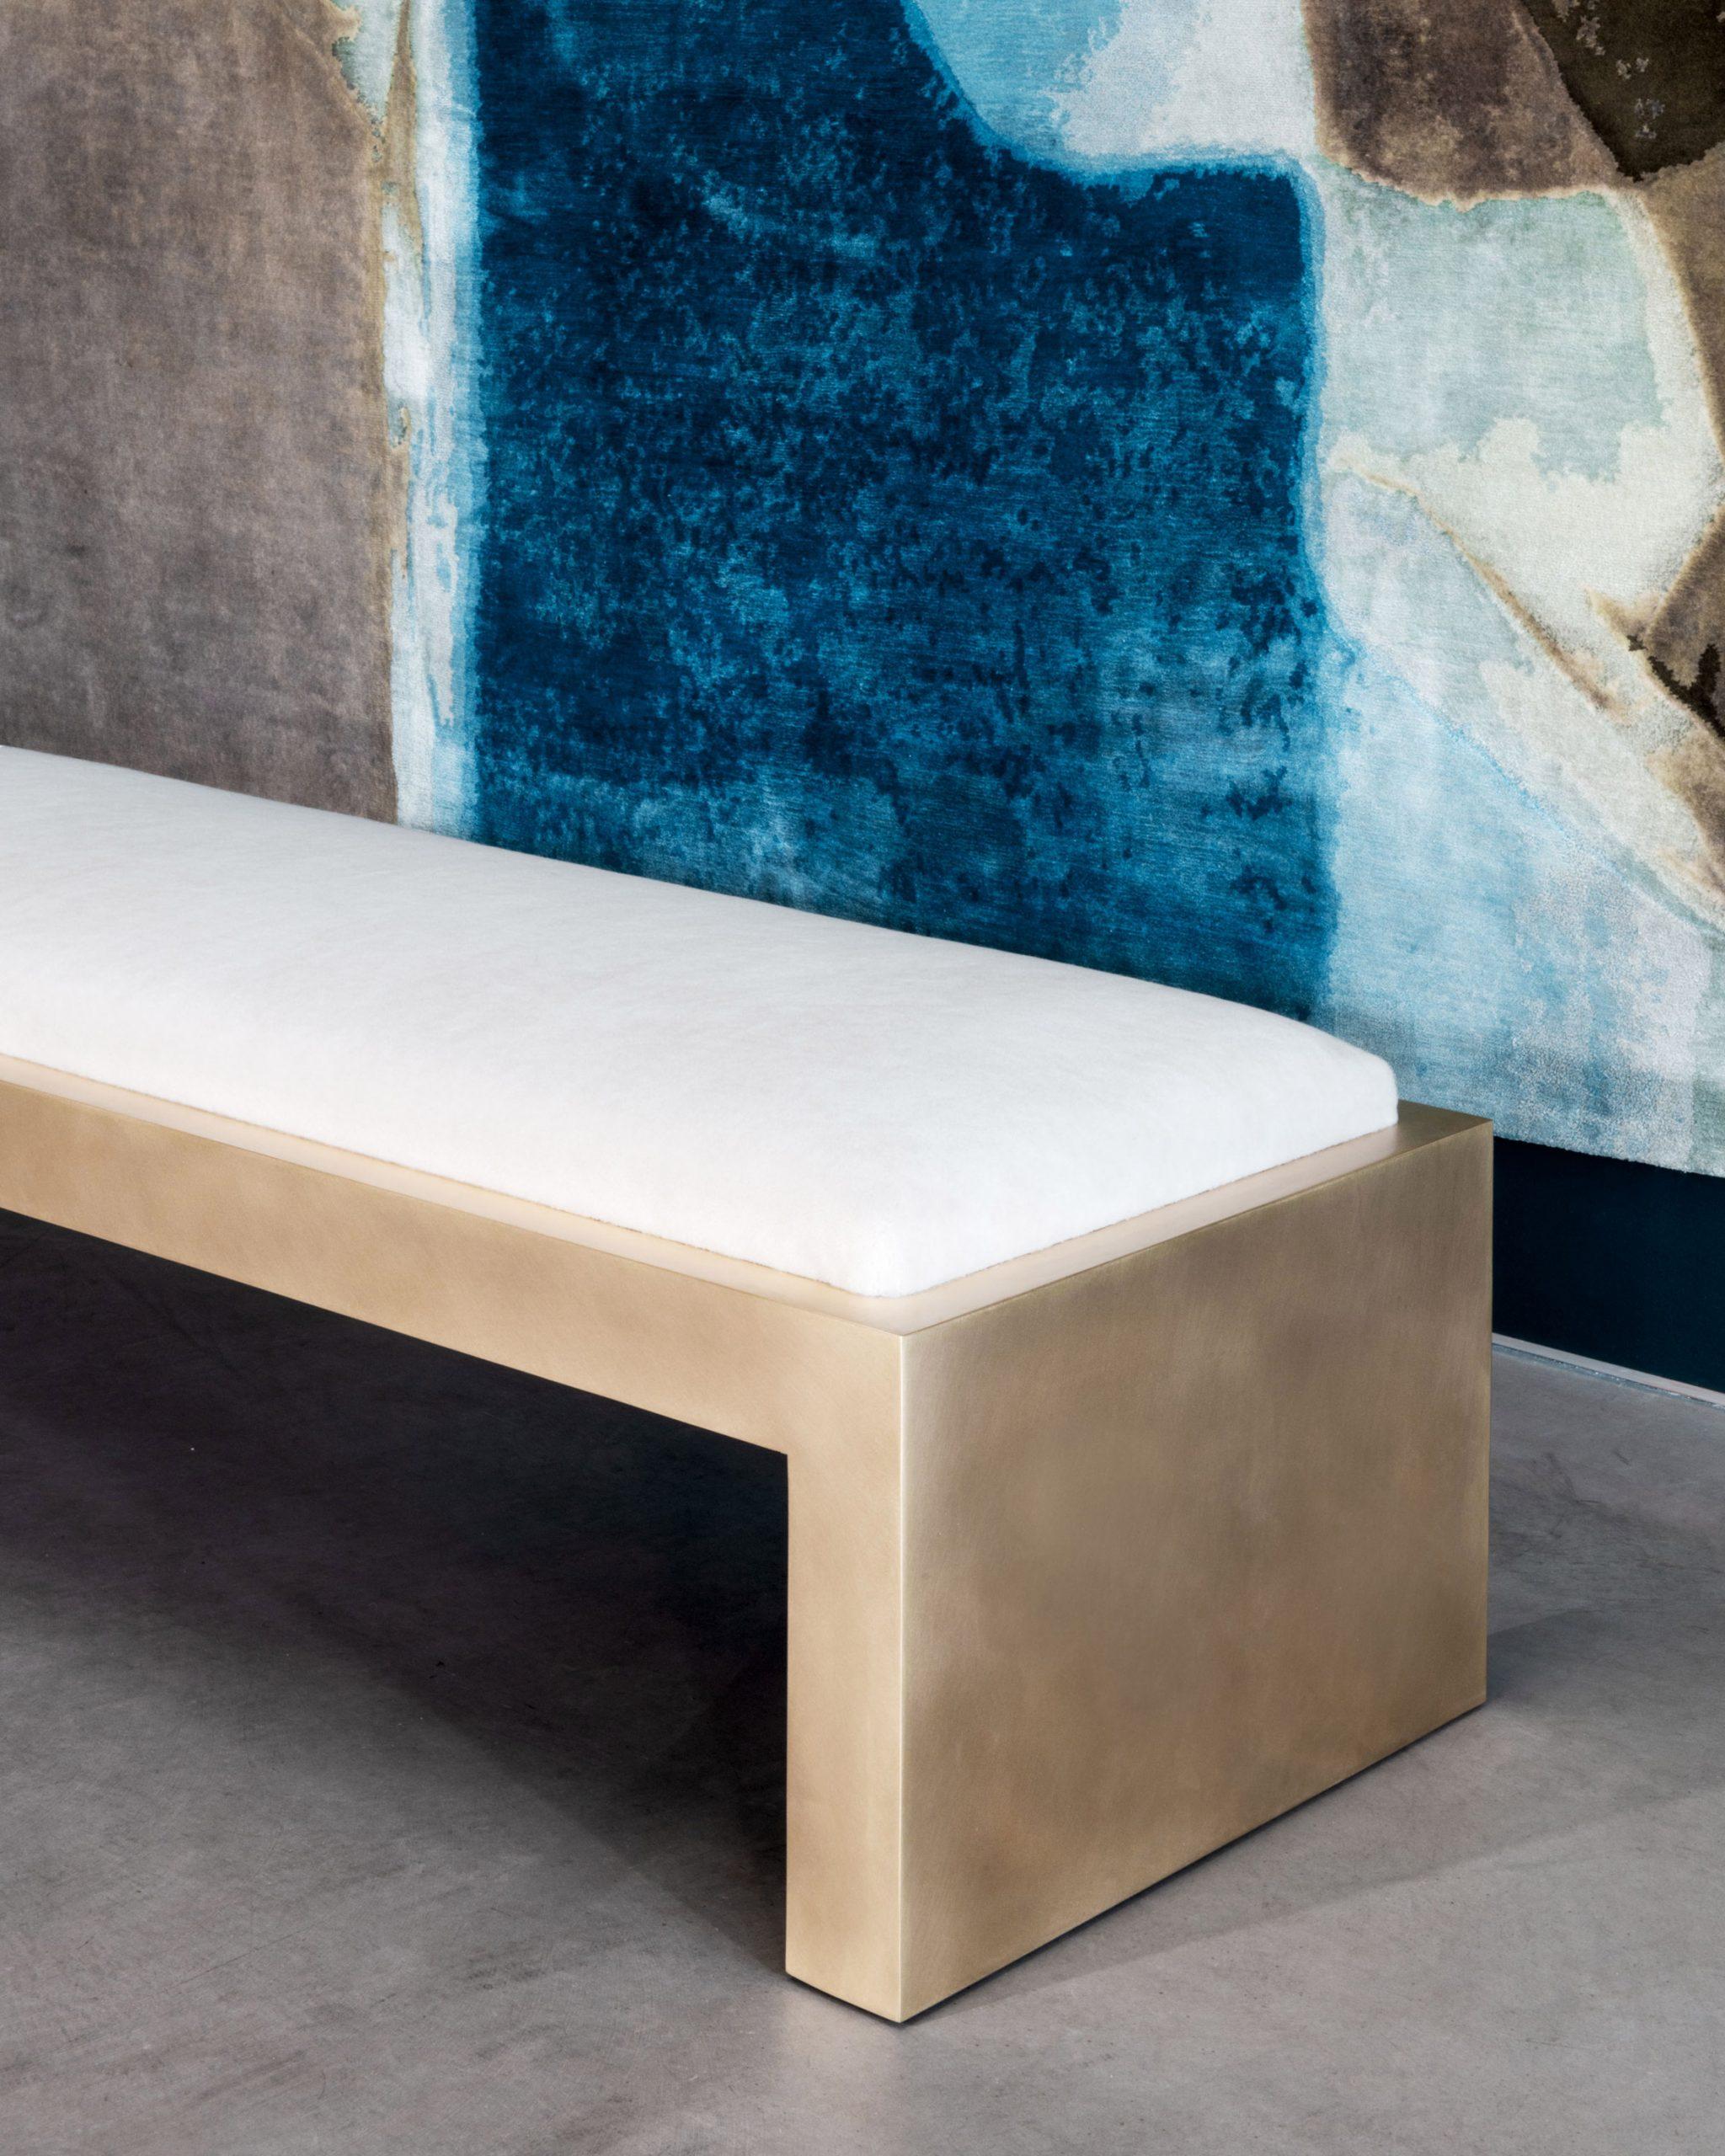 Offset Cube bench by Videre Licet via Twentieth gallery